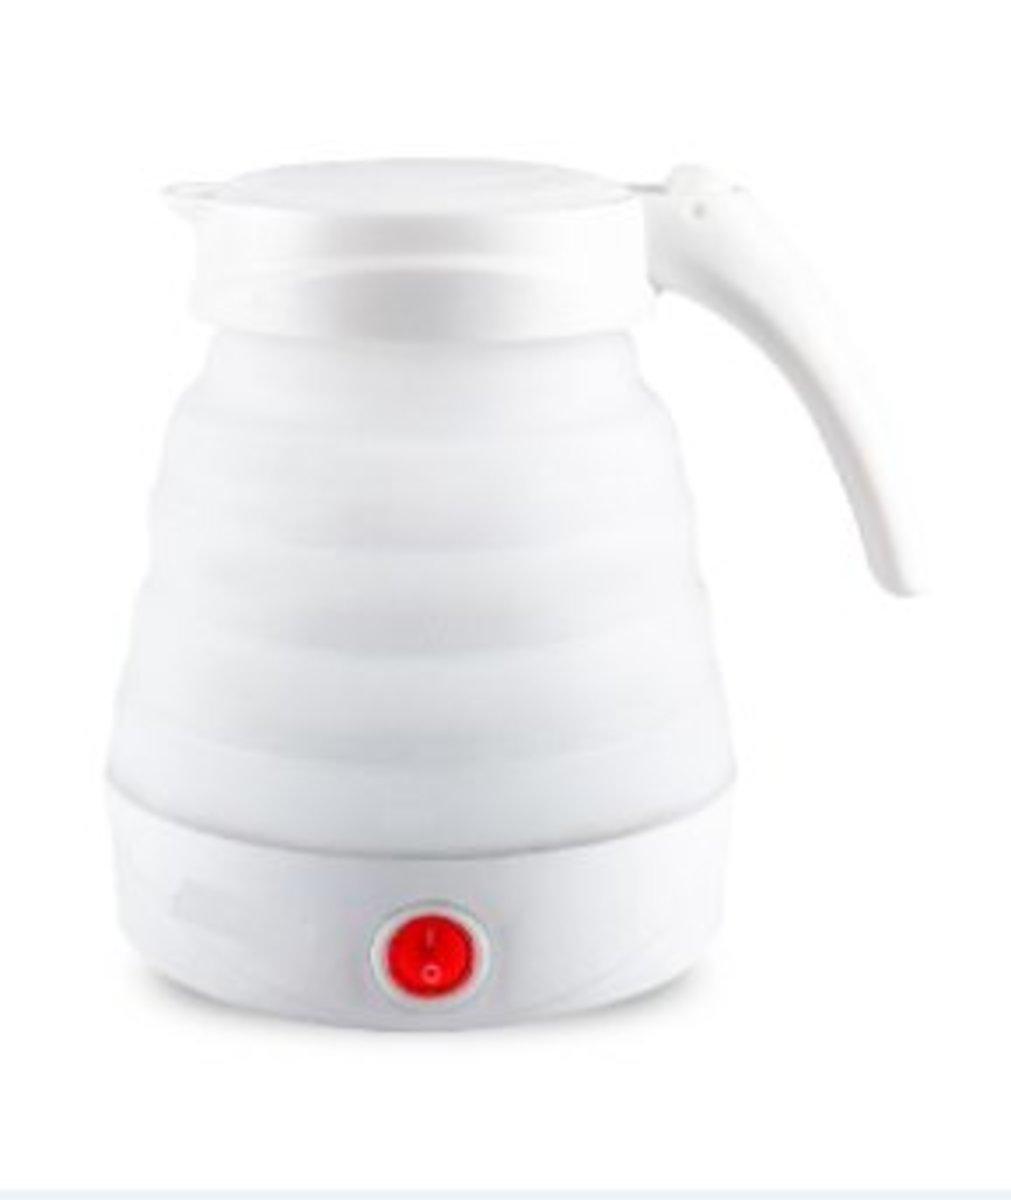 Double voltage folding travel kettle (White)